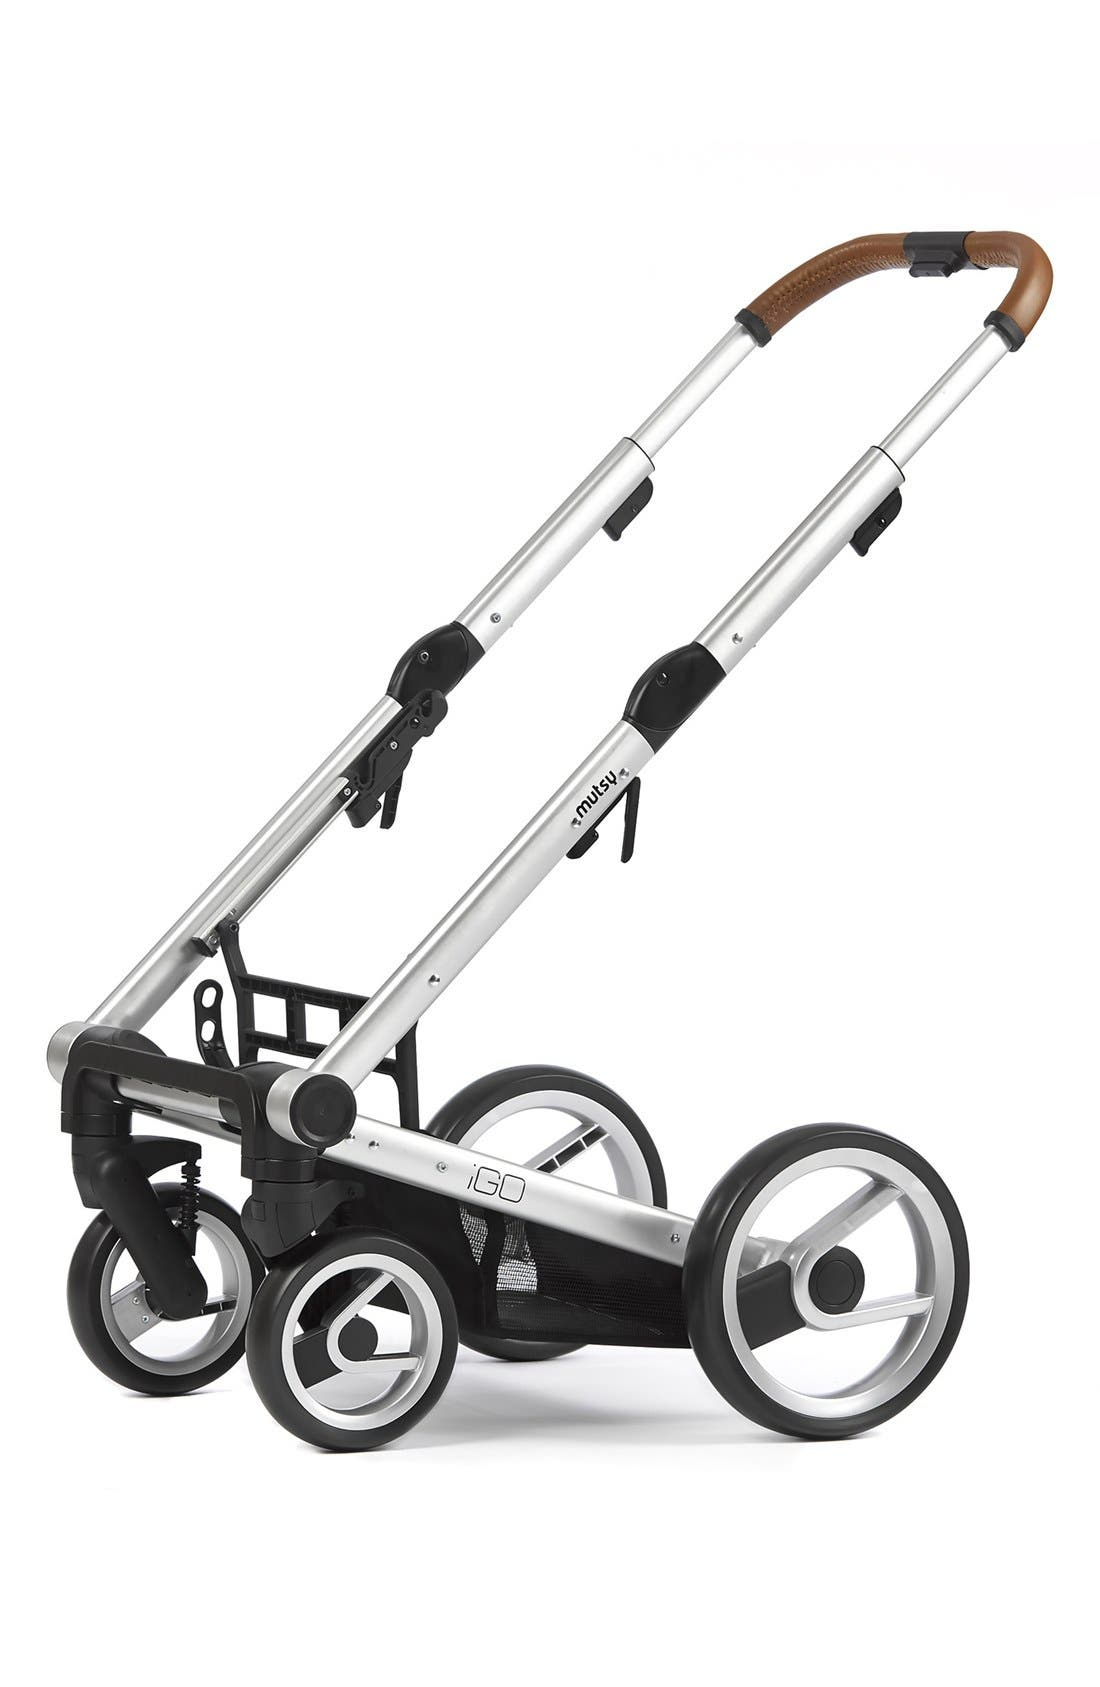 Igo - Urban Nomad Stroller,                             Alternate thumbnail 4, color,                             020